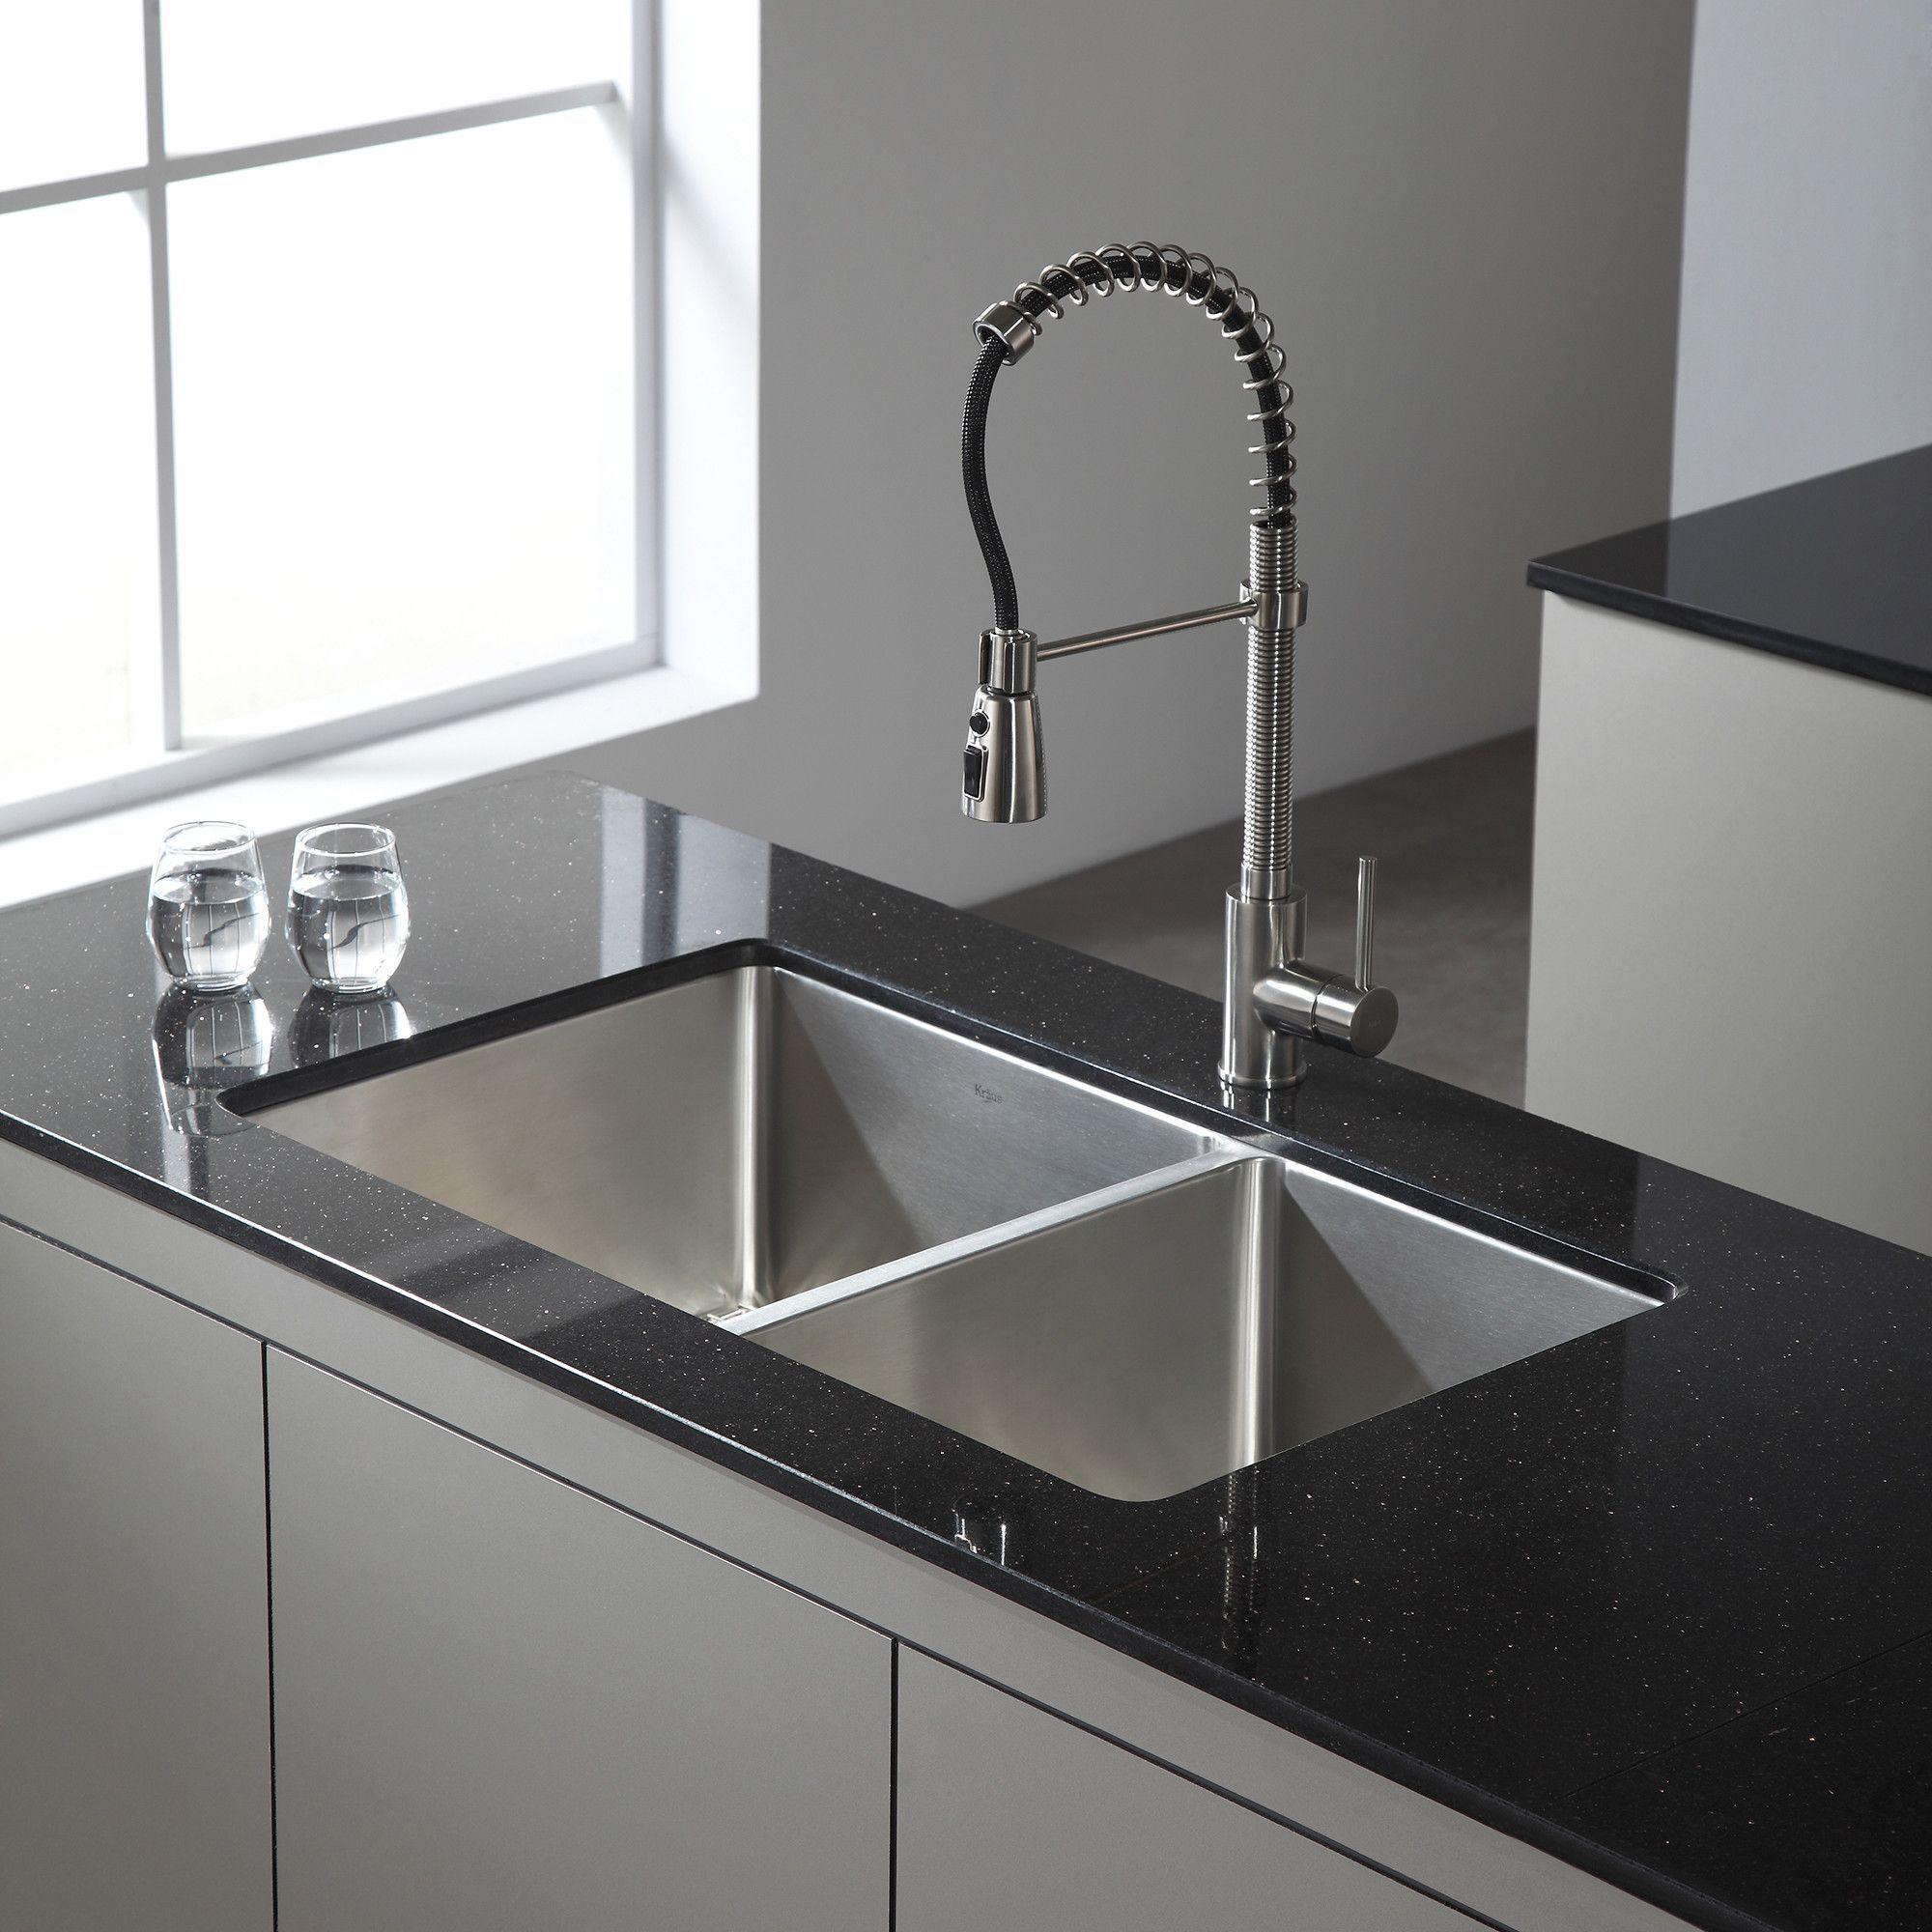 Standart 33 L X 19 W Double Basin Undermount Kitchen Sink With Drain Assembly Undermount Kitchen Sinks Kitchen Remodel Small Kitchen Faucet